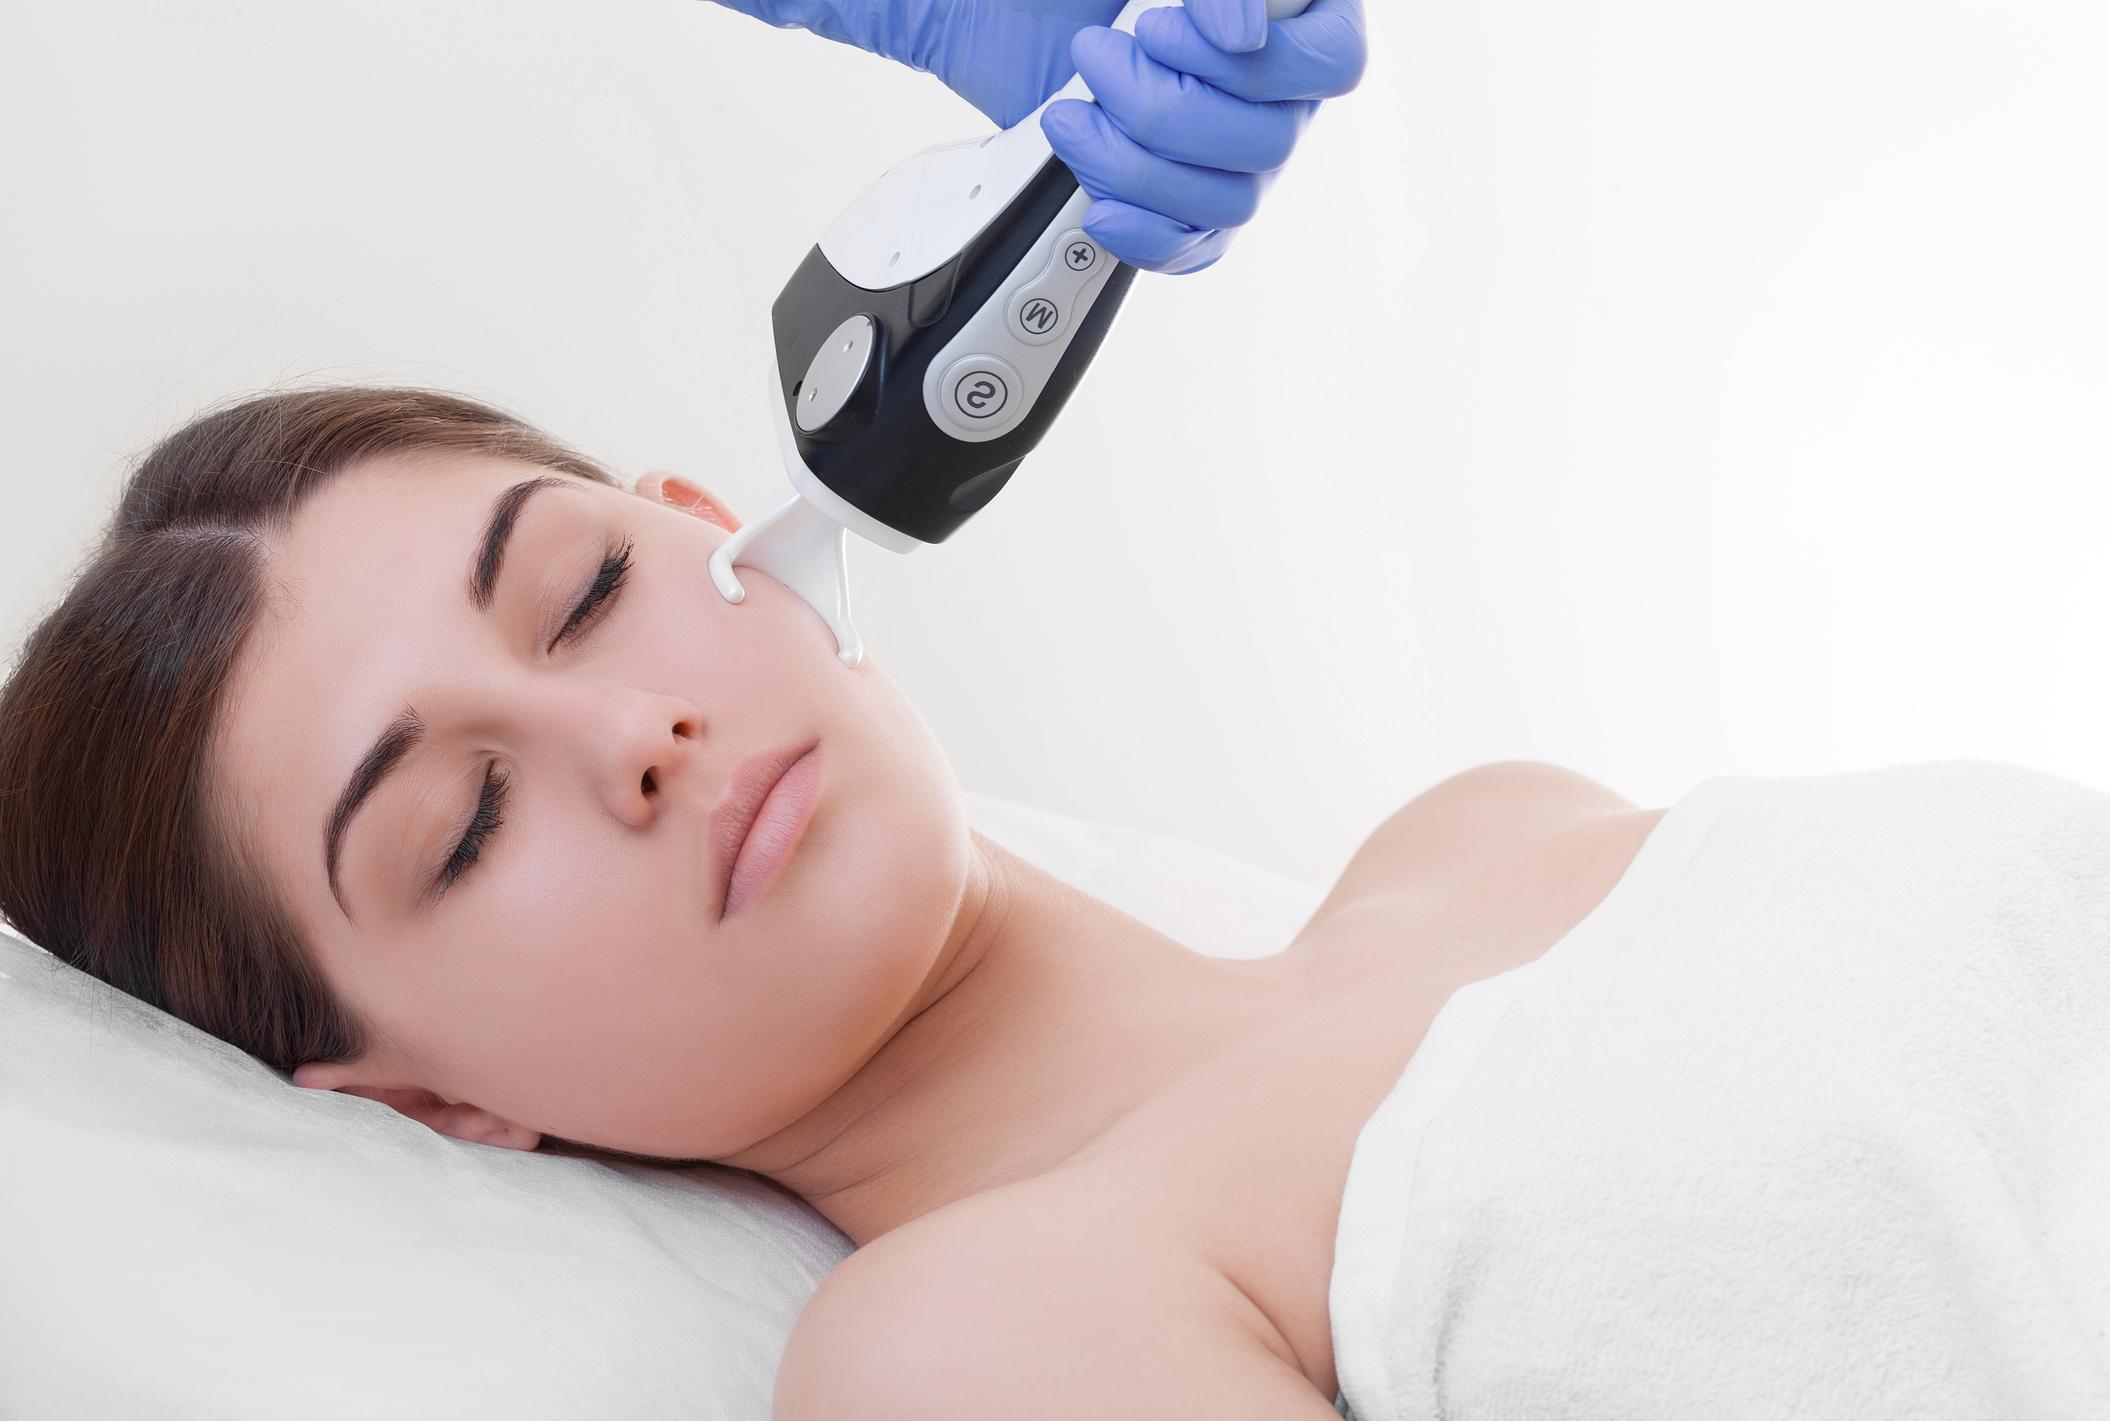 woman making laser skin resurfacing in aesthetic medicine.